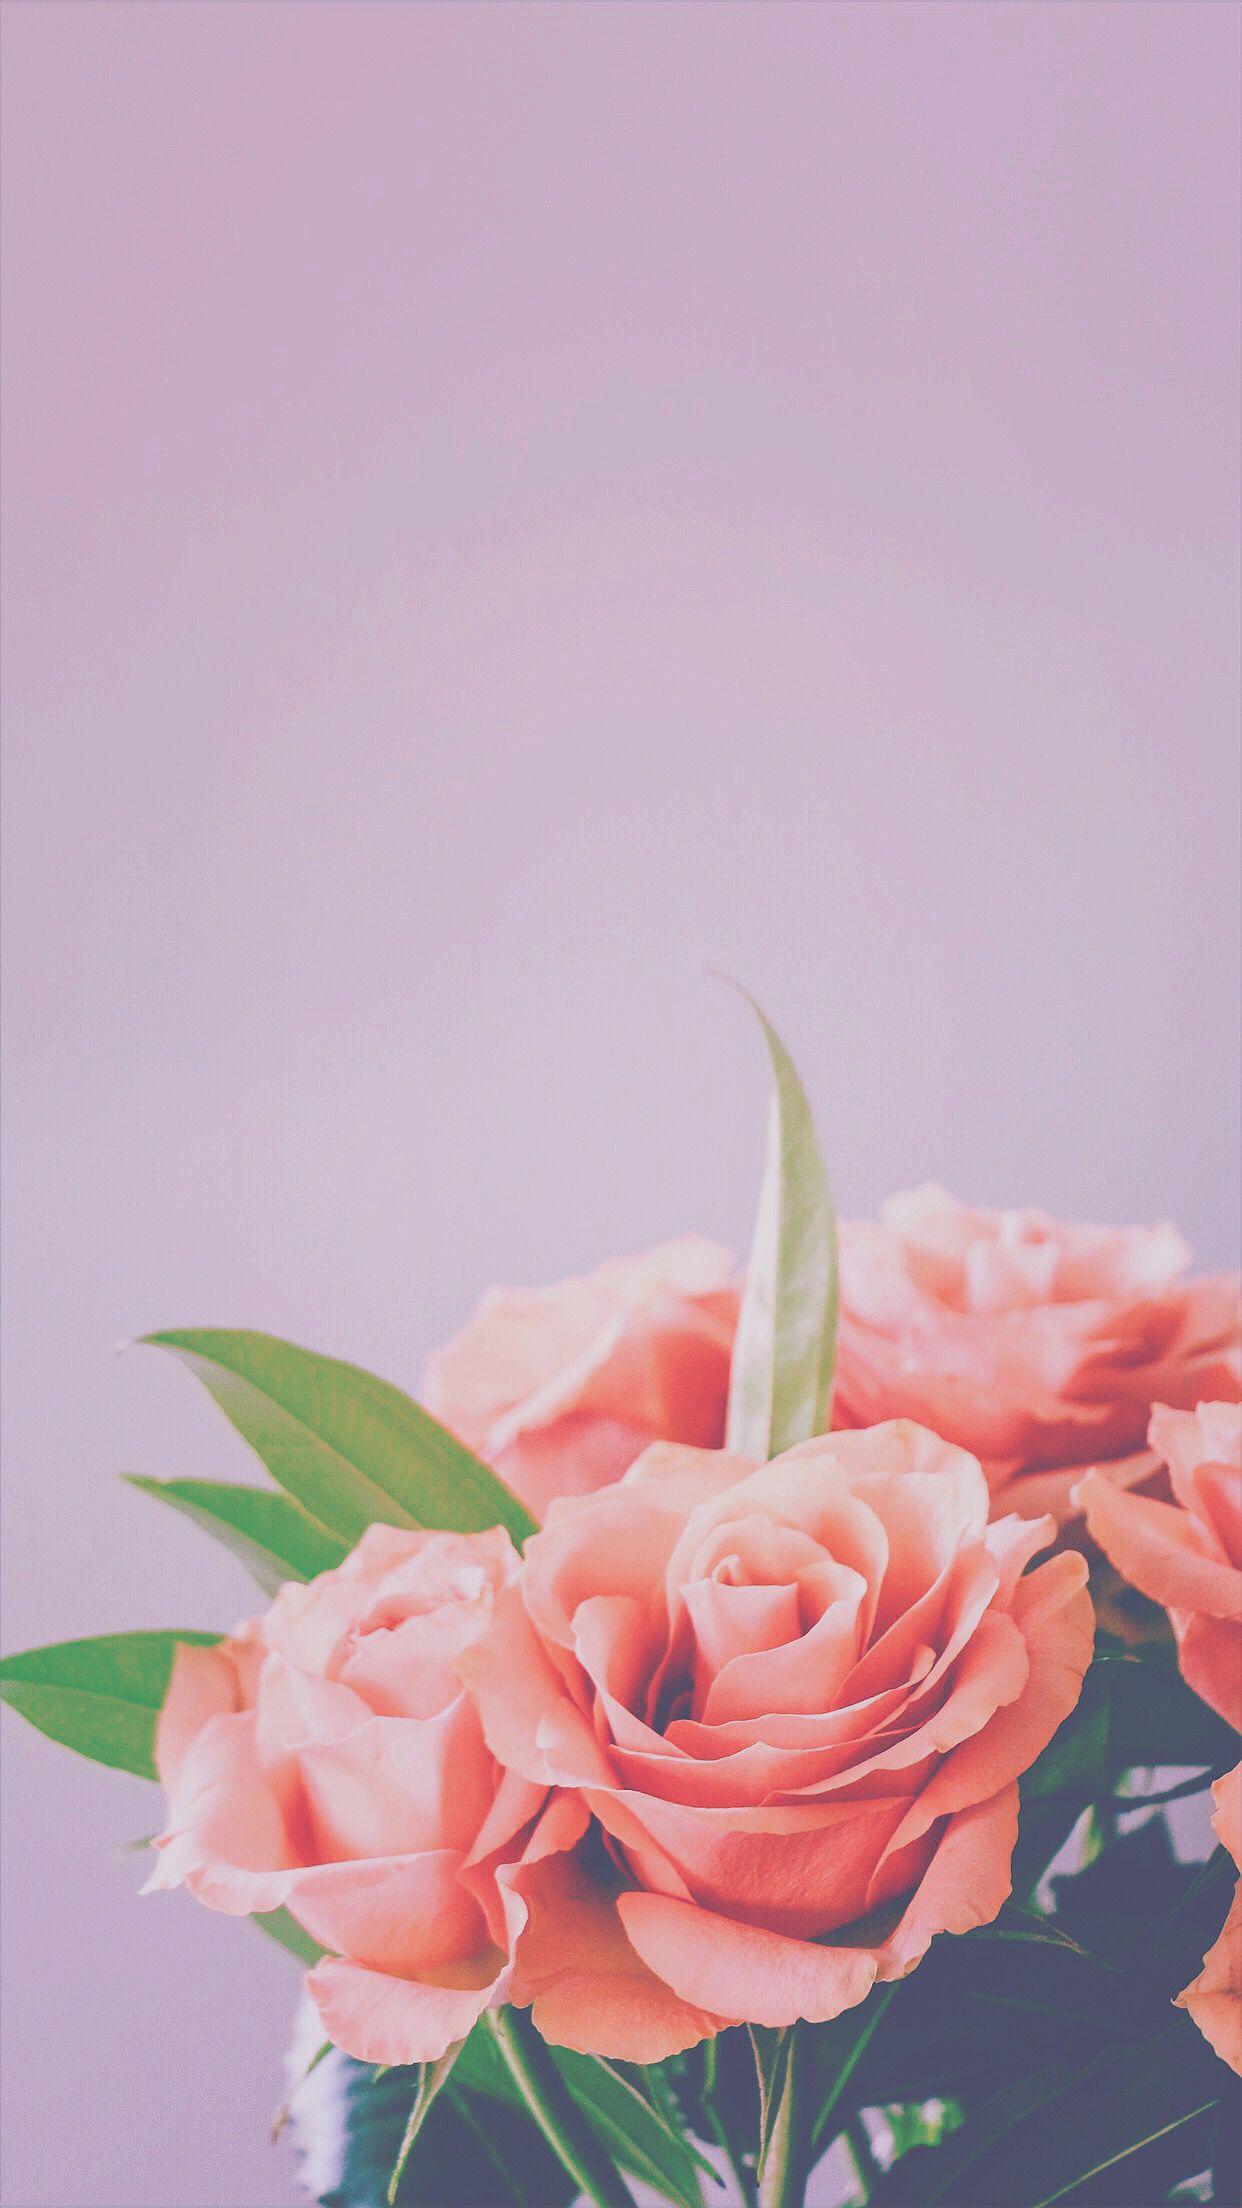 Iphone 6 Plus Iphone 6s Plus Amp Iphone 7 Plus Live Wallpaper Iphone 7 Flower Wallpaper Pink Flowers Wallpaper